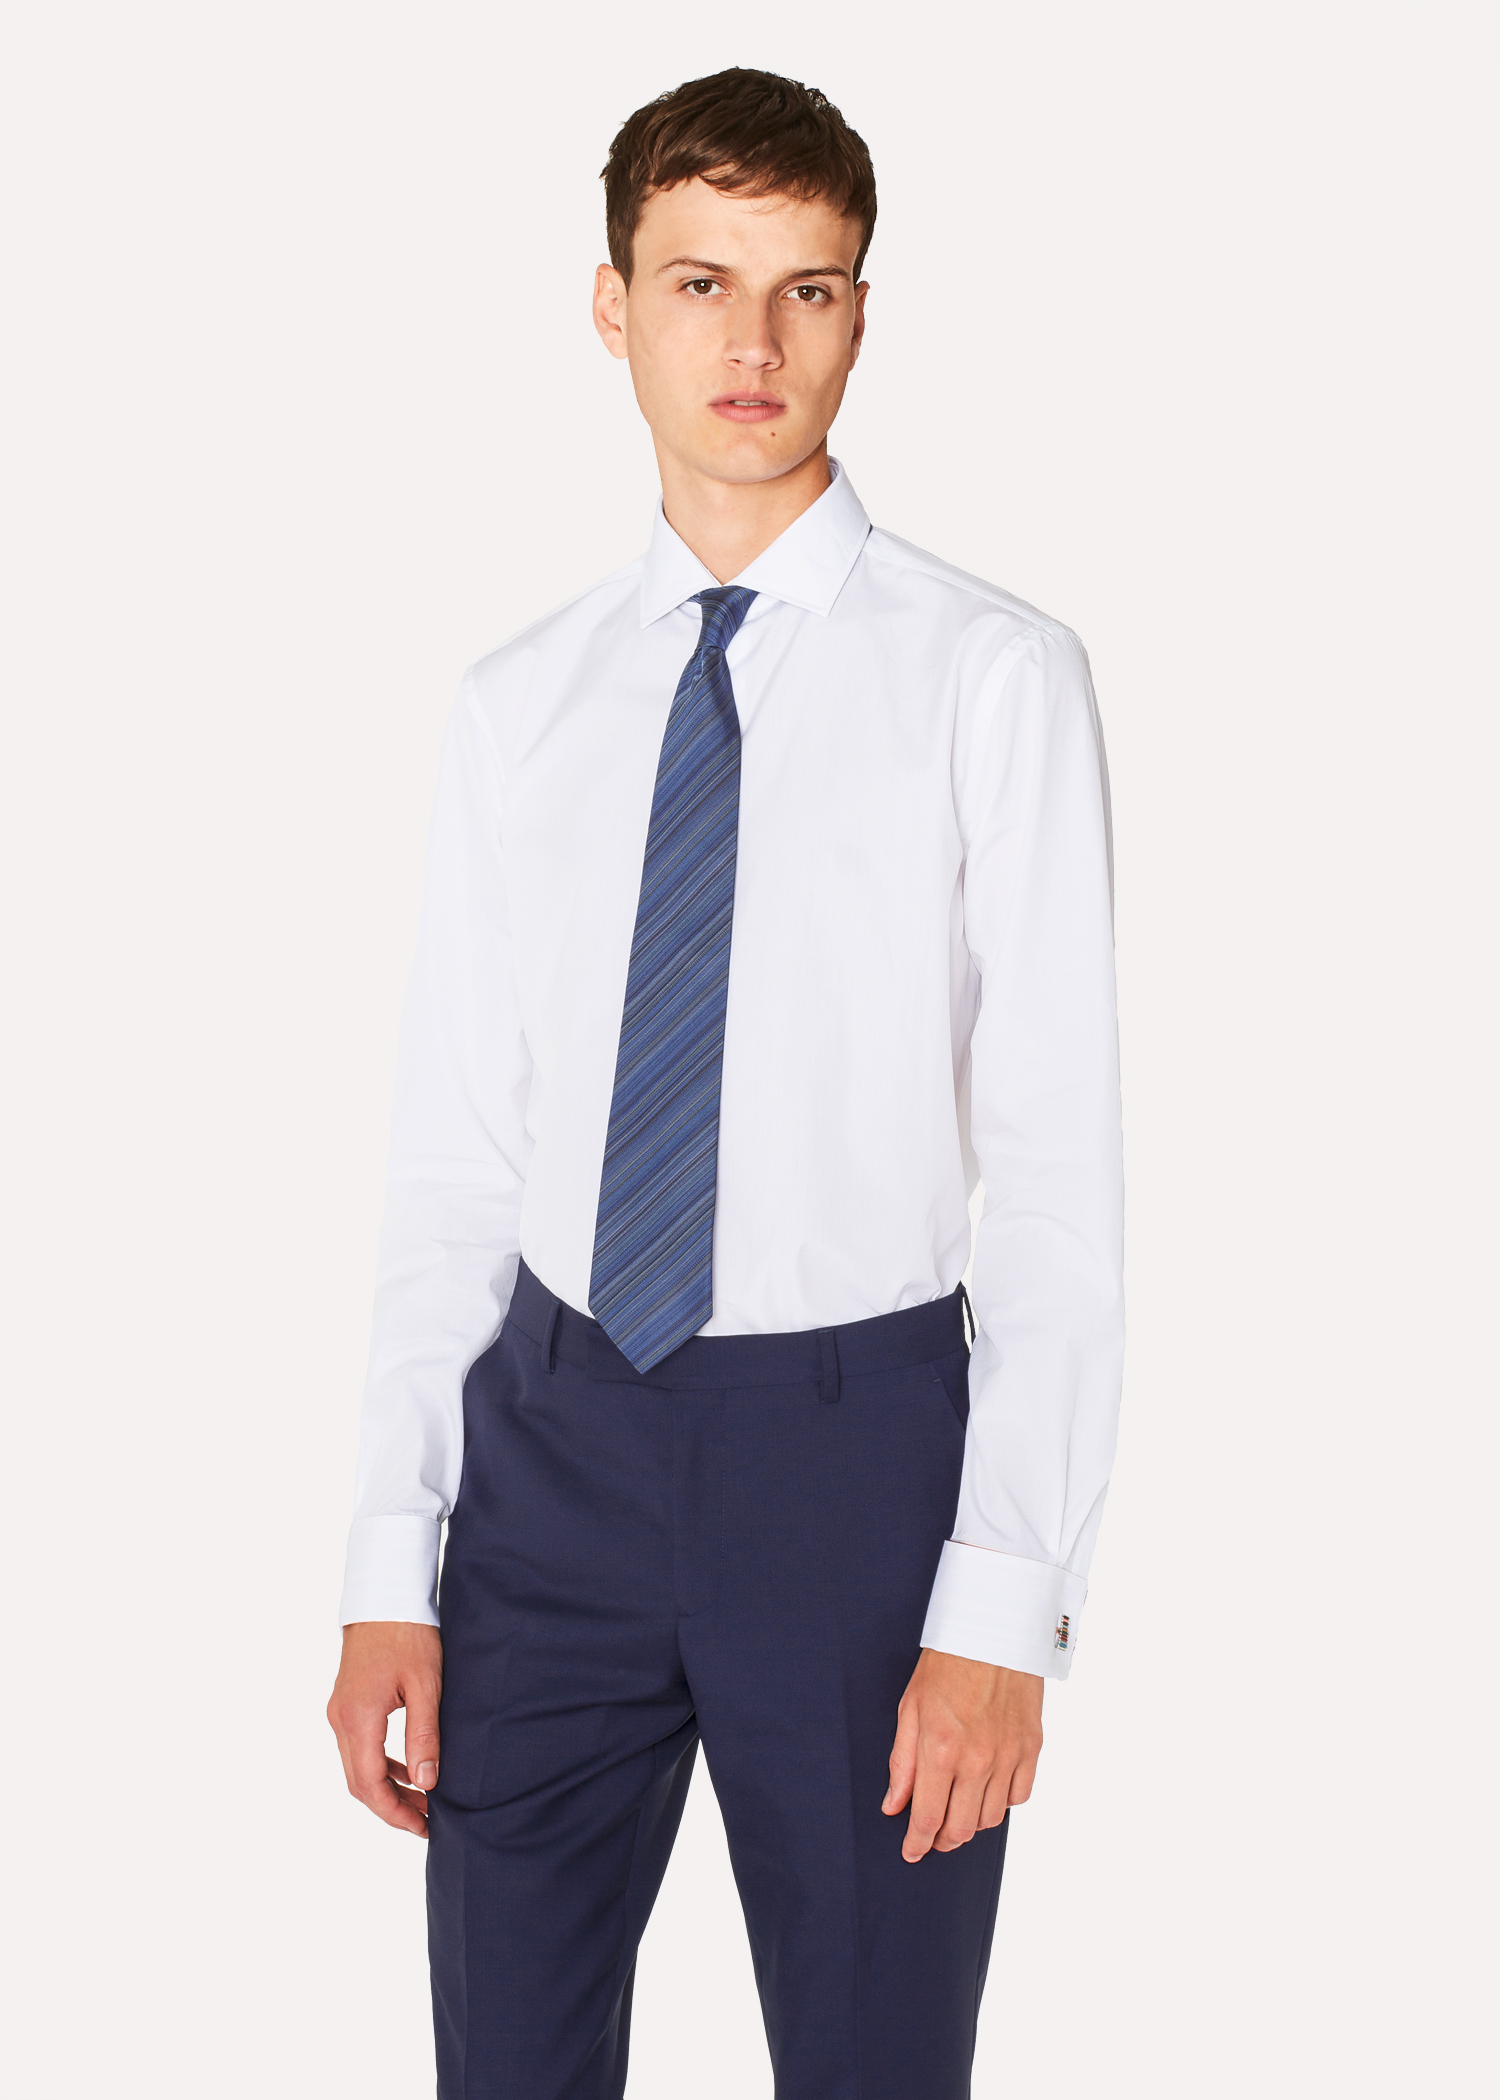 Mens Tailored Fit White Signature Stripe Double Cuff Shirt Paul